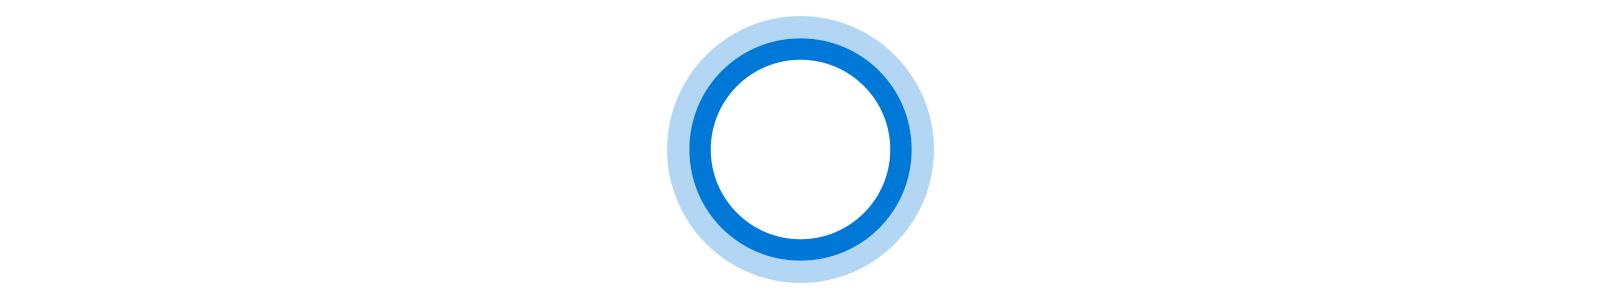 Cortana アニメーション アイコン